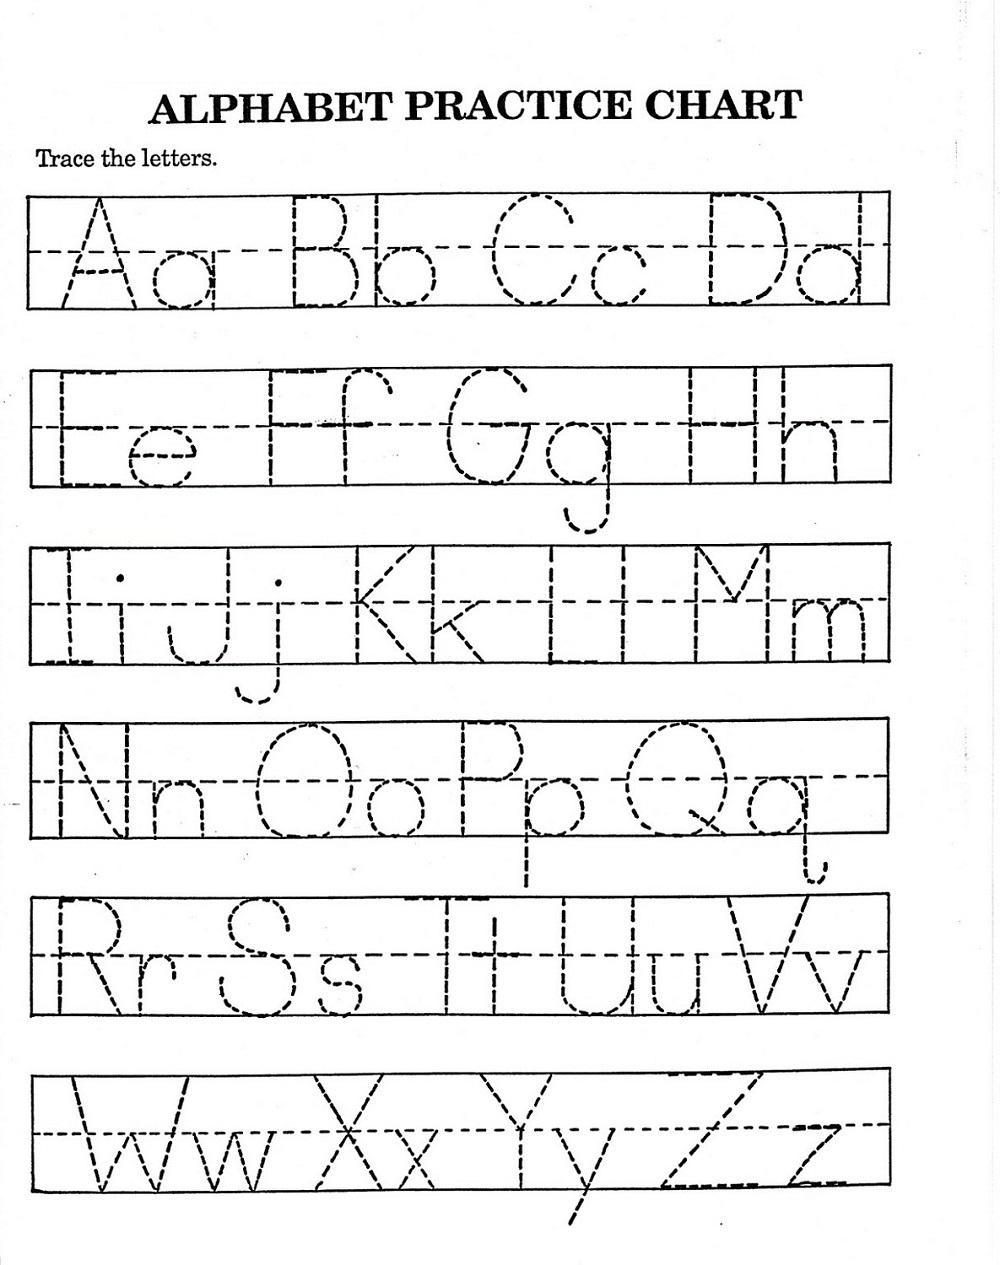 Alphabet Tracing For Kids A-Z | Activity Shelter inside A-Z Alphabet Tracing